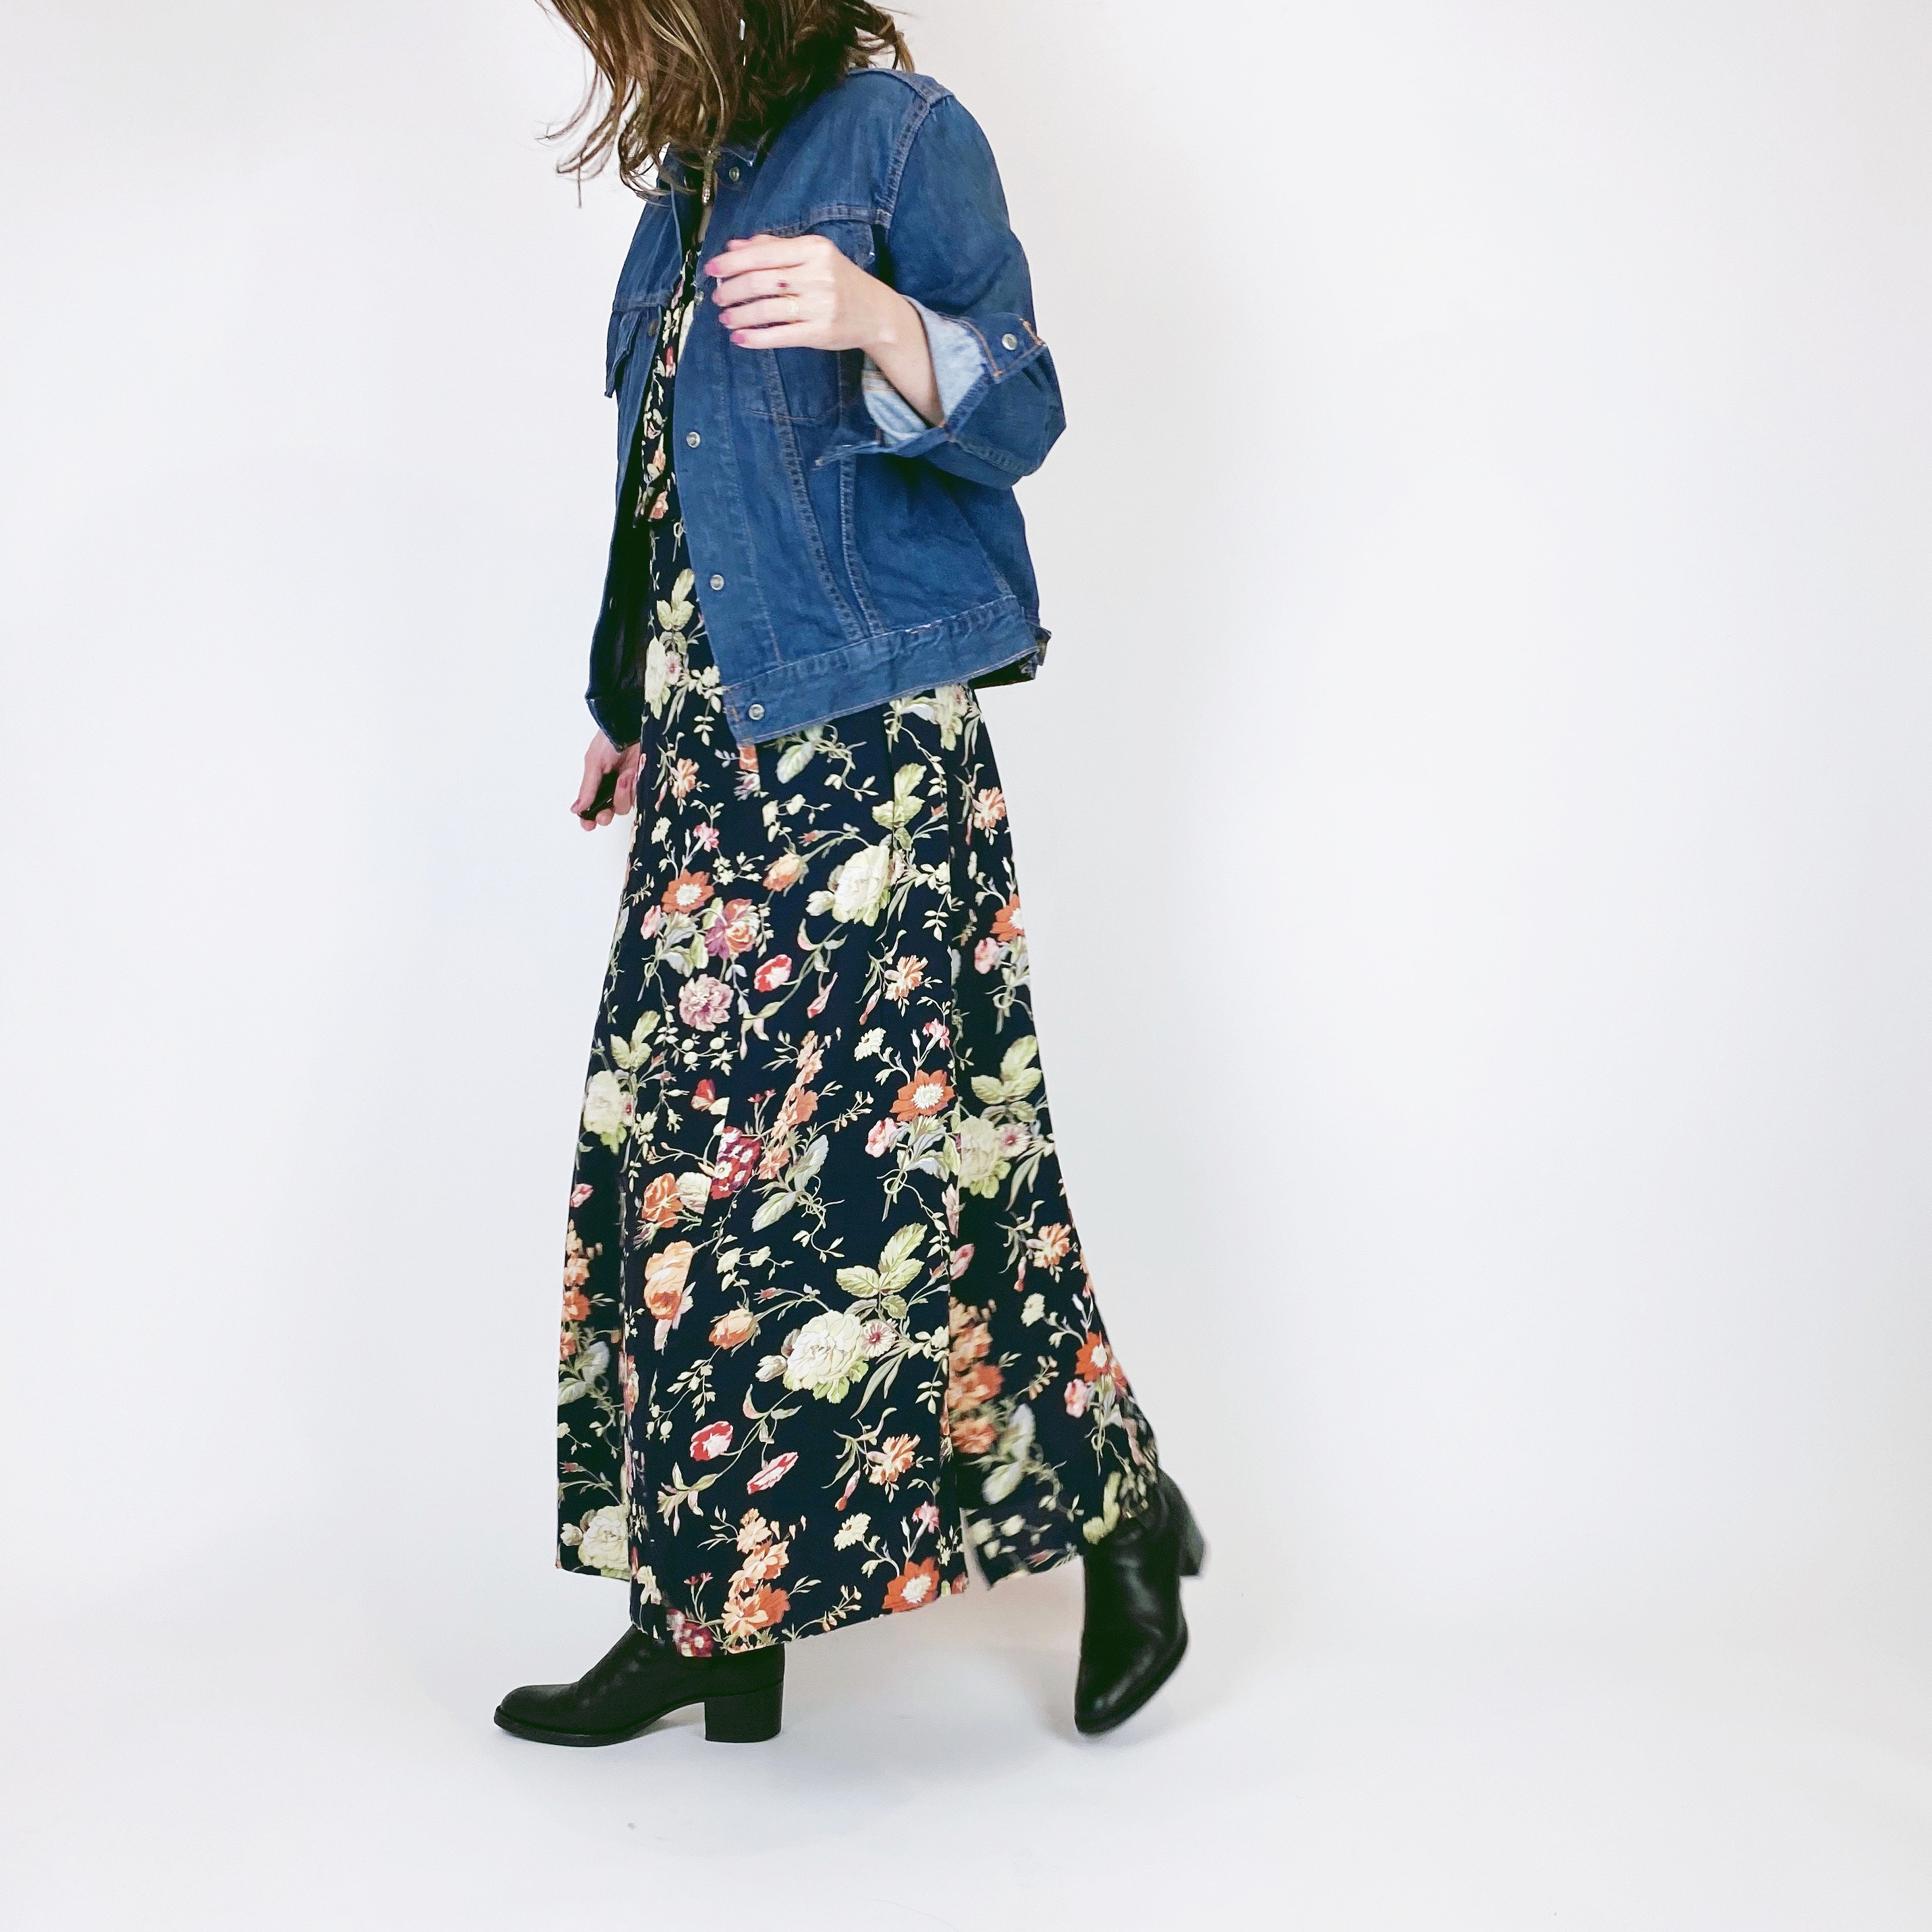 ◼︎90s botanical flower rayon vest dress from Denmark◼︎